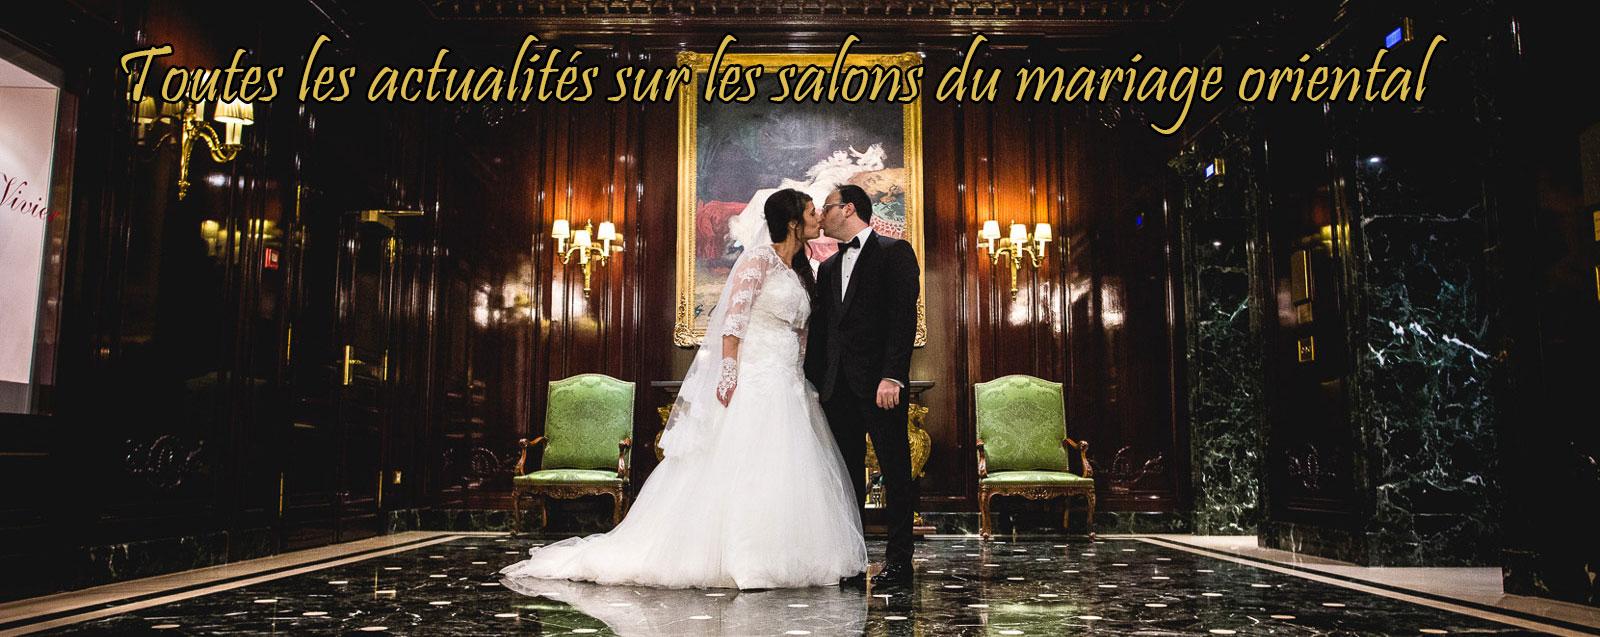 salon mariage oriental